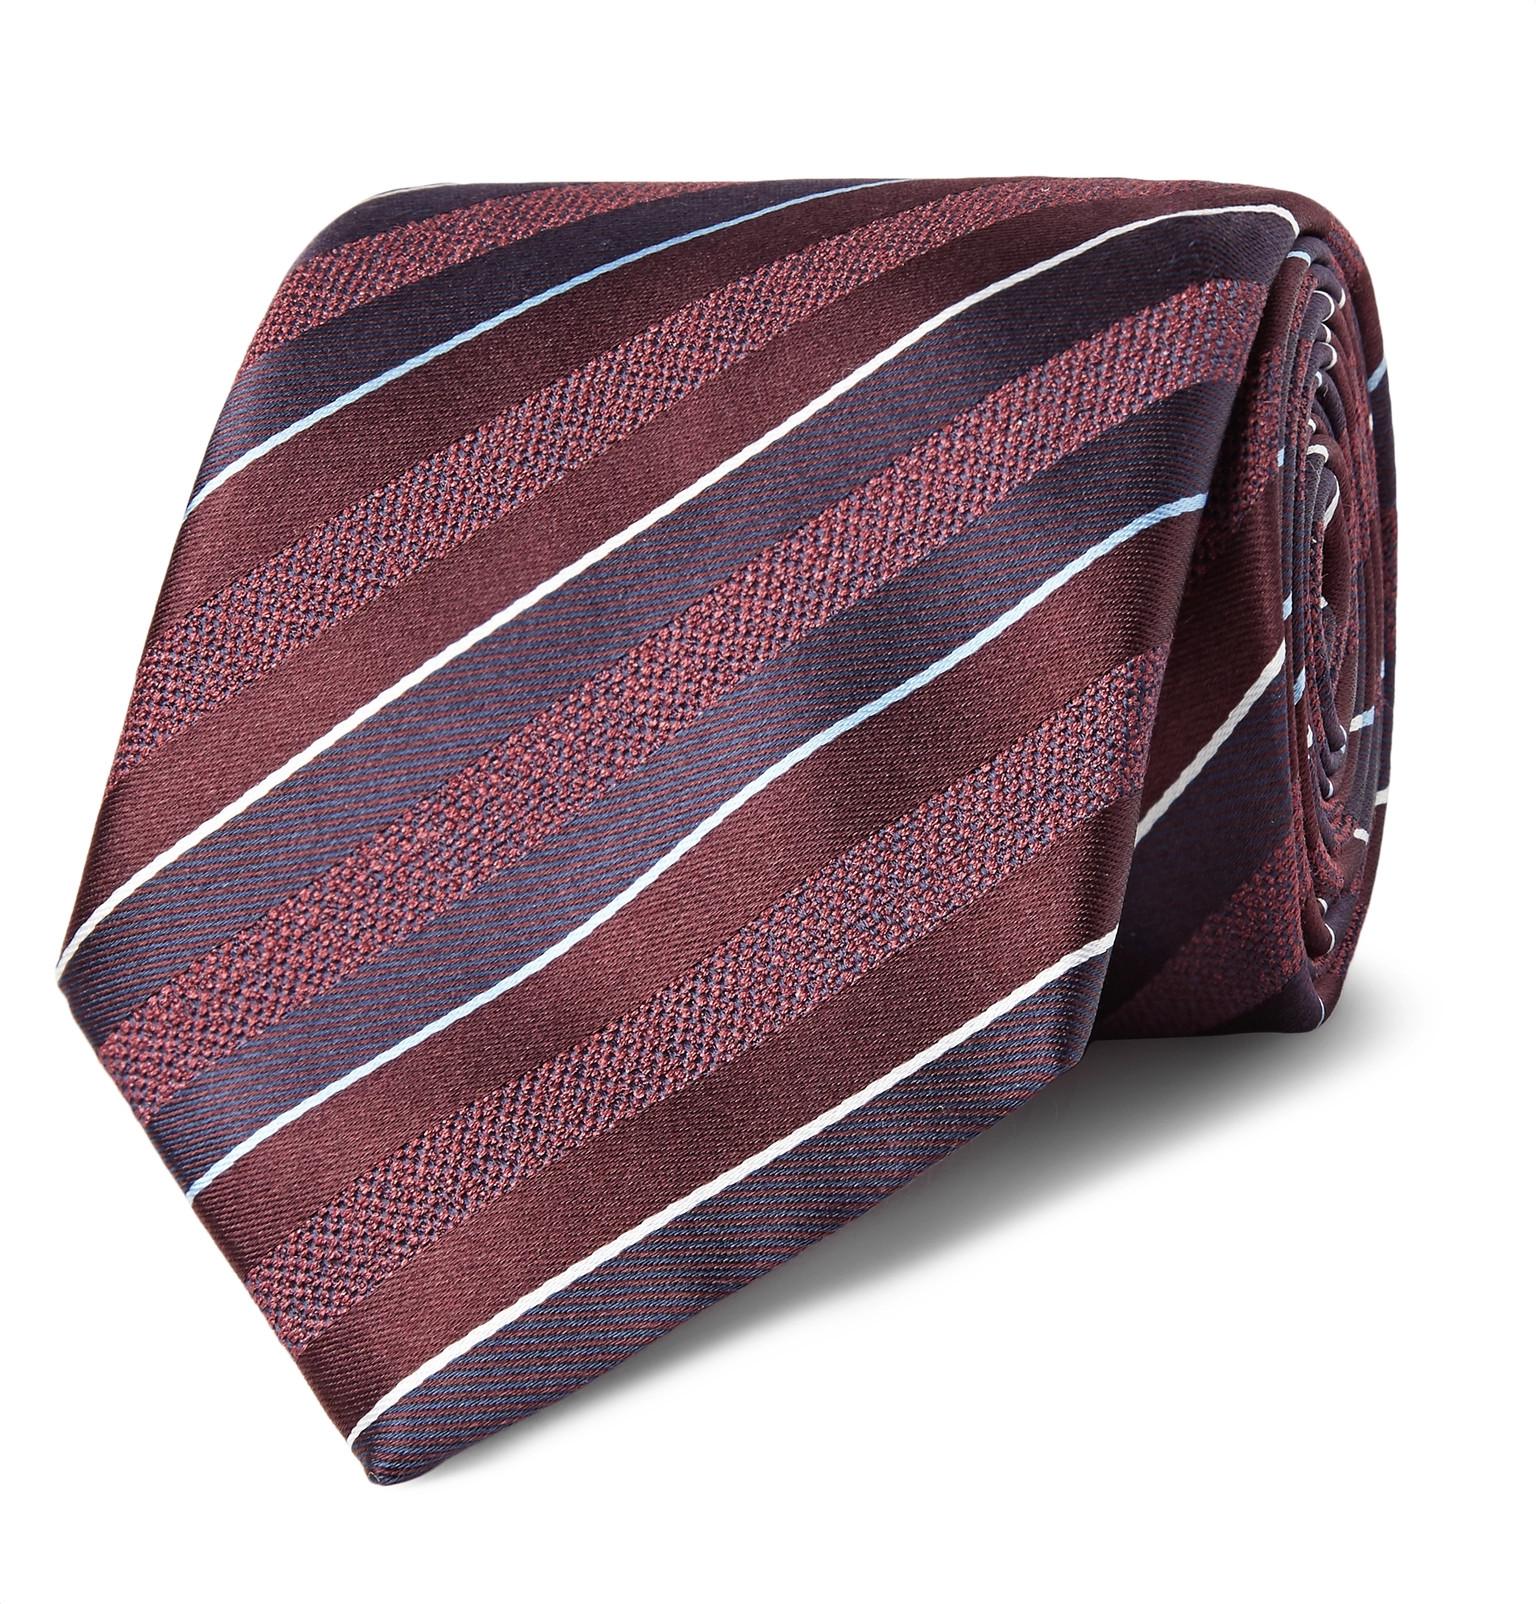 8cm Striped Silk-jacquard Tie Brioni 5Sbu5